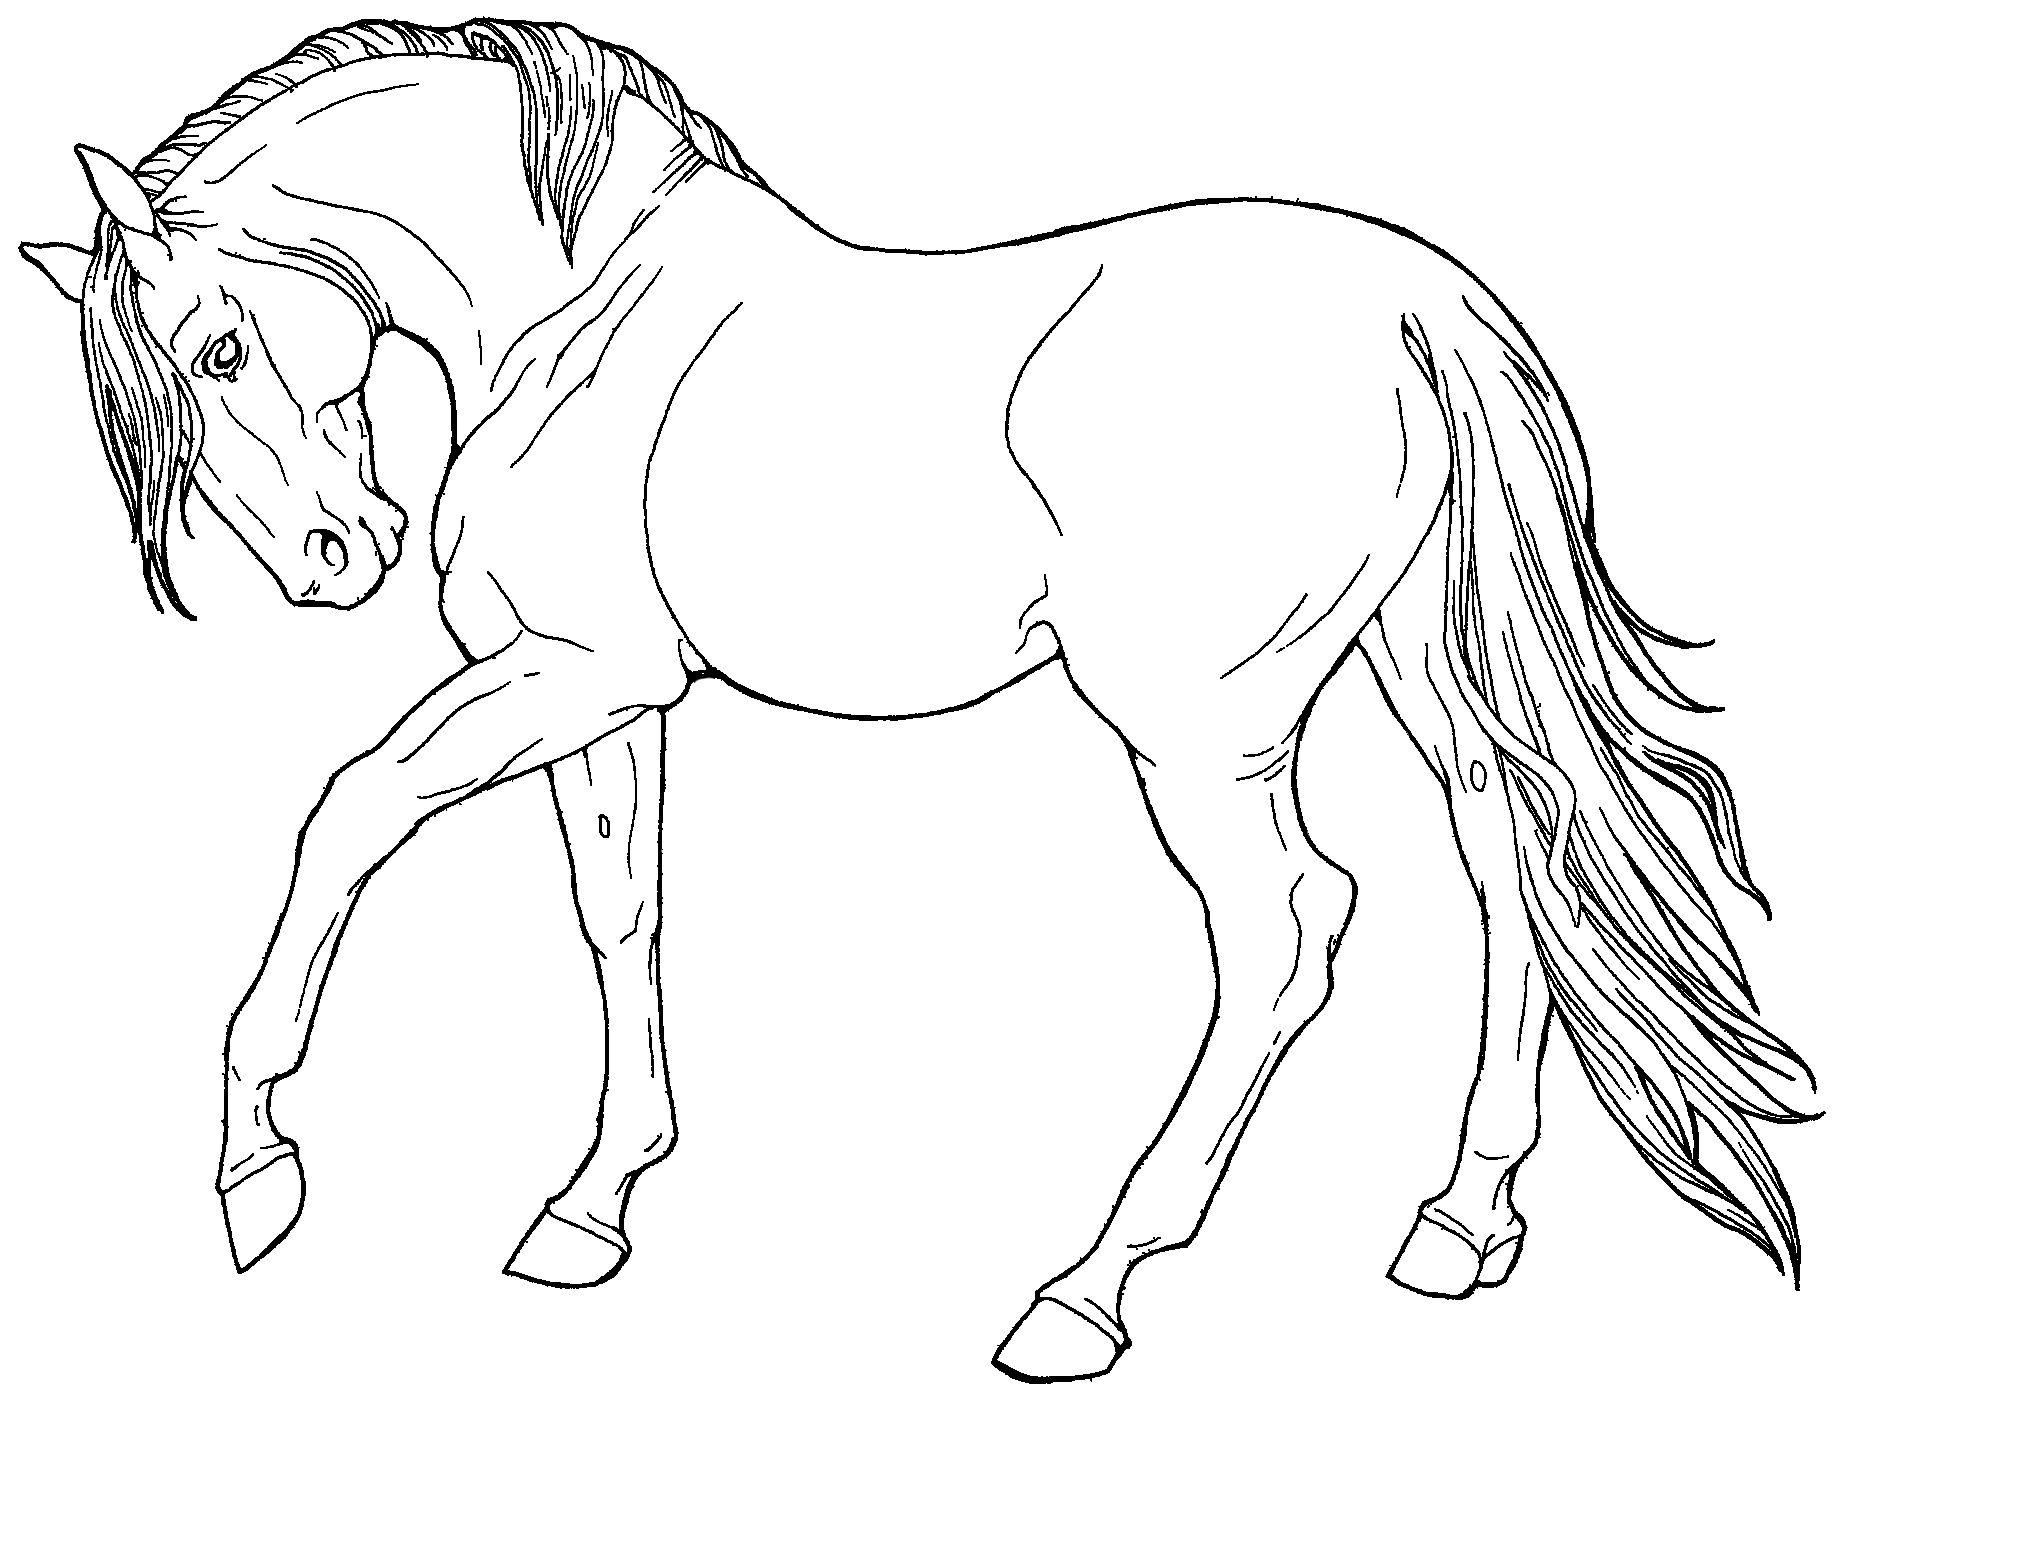 Free Line Art Fine Horse By Applehunter On Deviantart Horse Coloring Pages Horse Coloring Horse Drawings